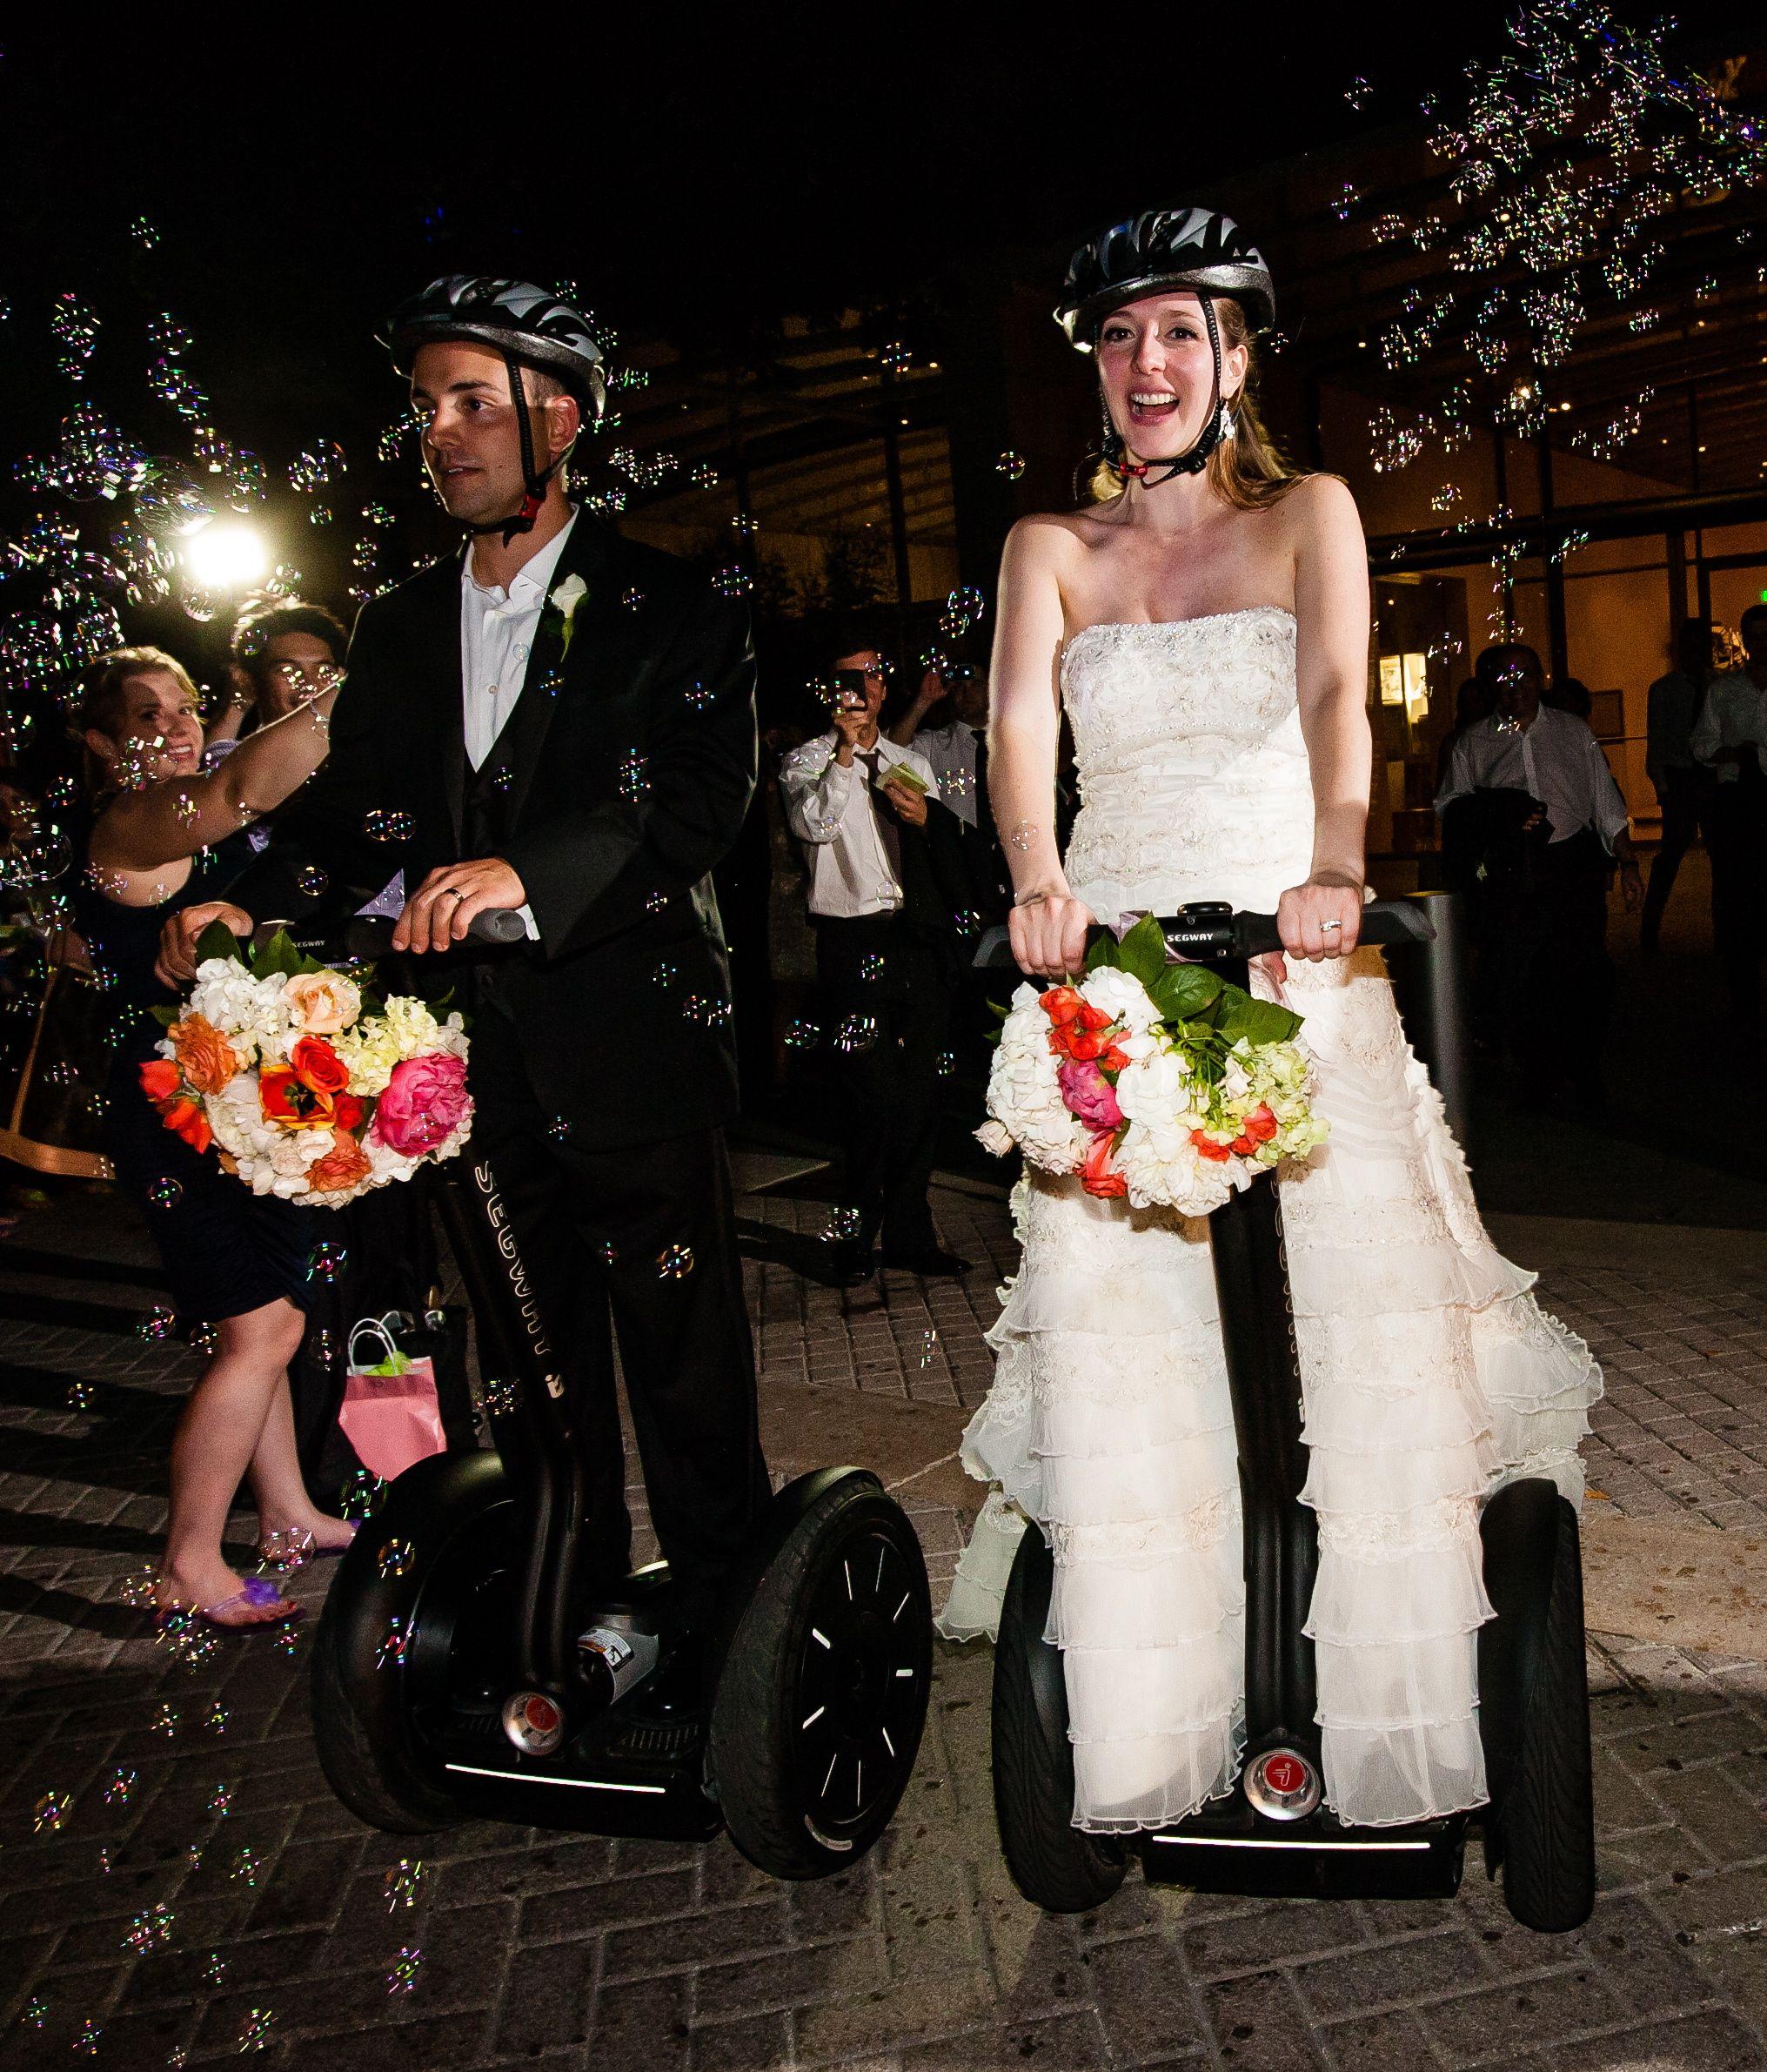 Segway wedding